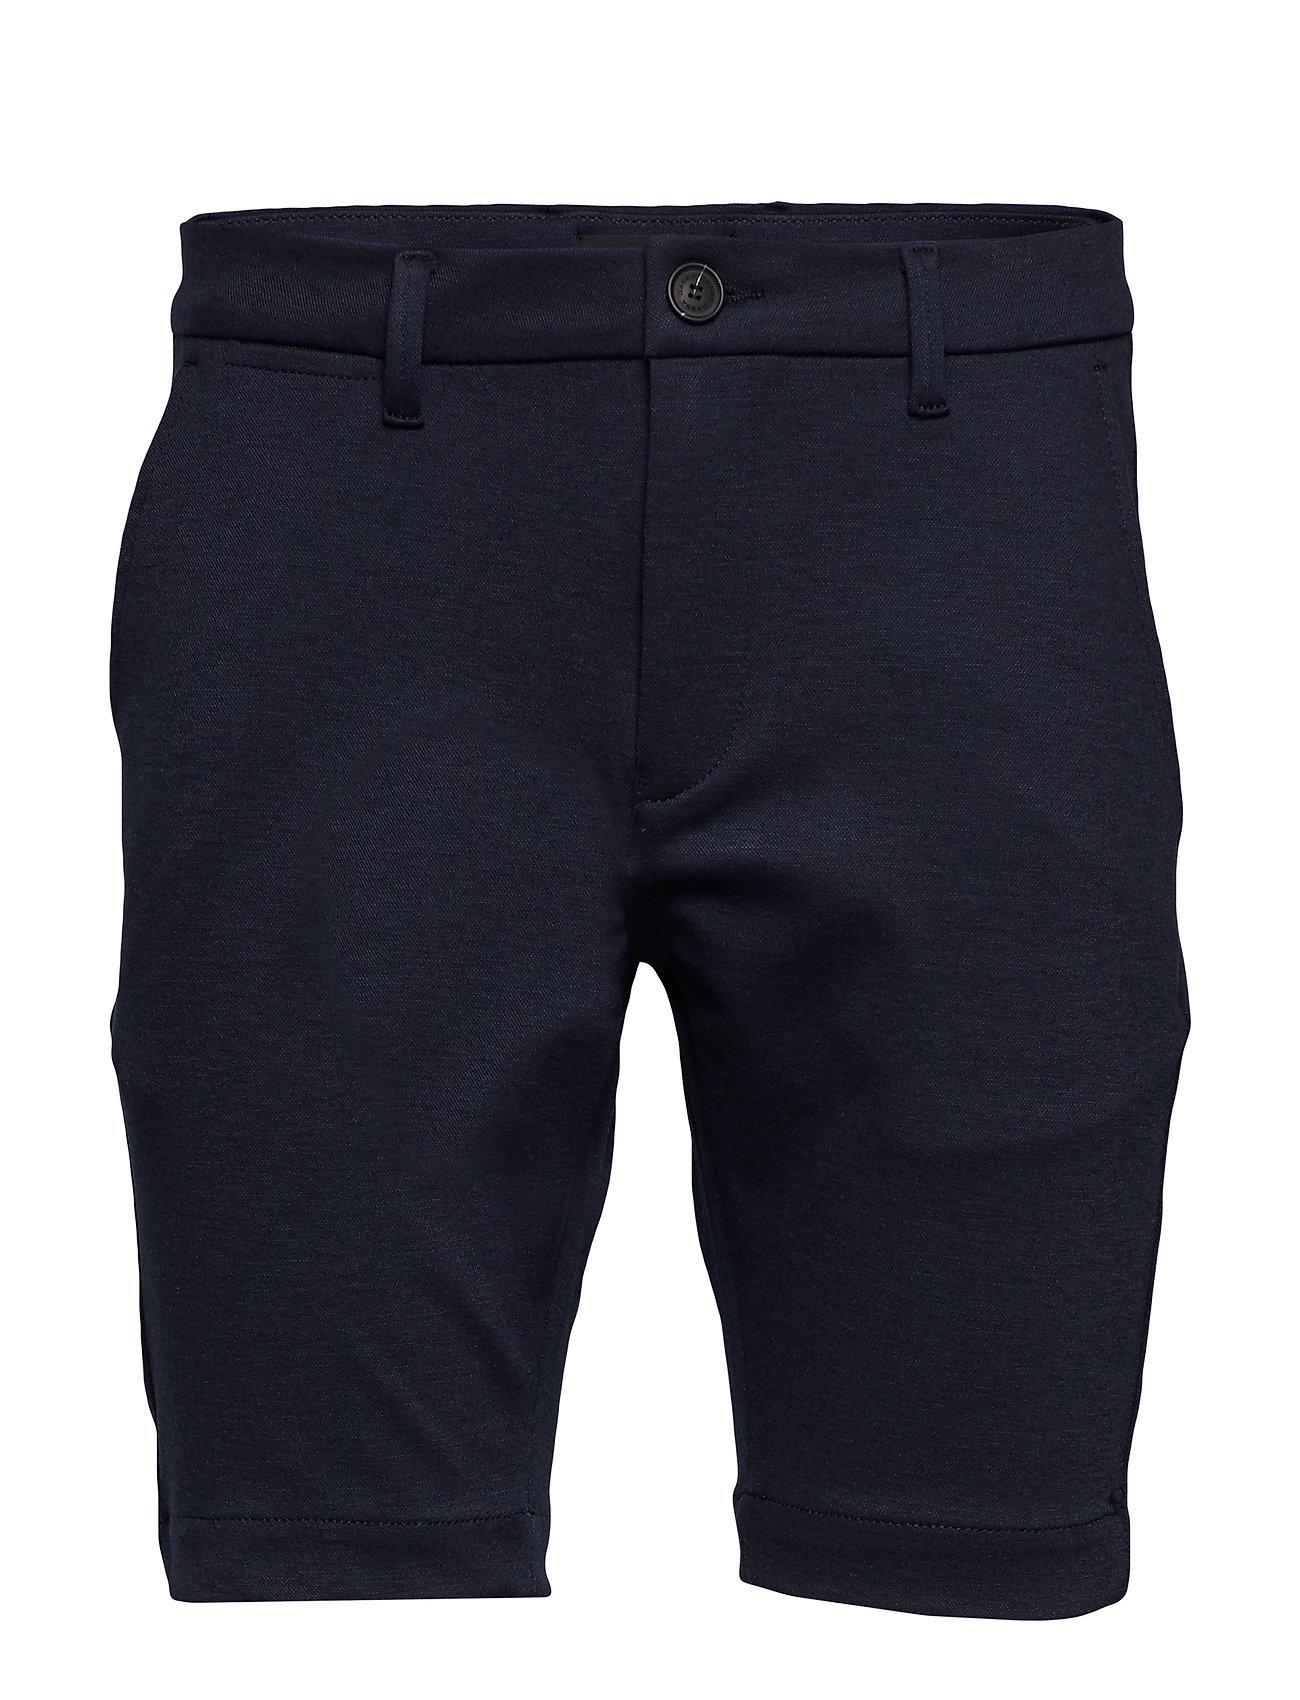 Image of Jason Chino Jersey Shorts Shorts Casual Blå Gabba (3562603835)